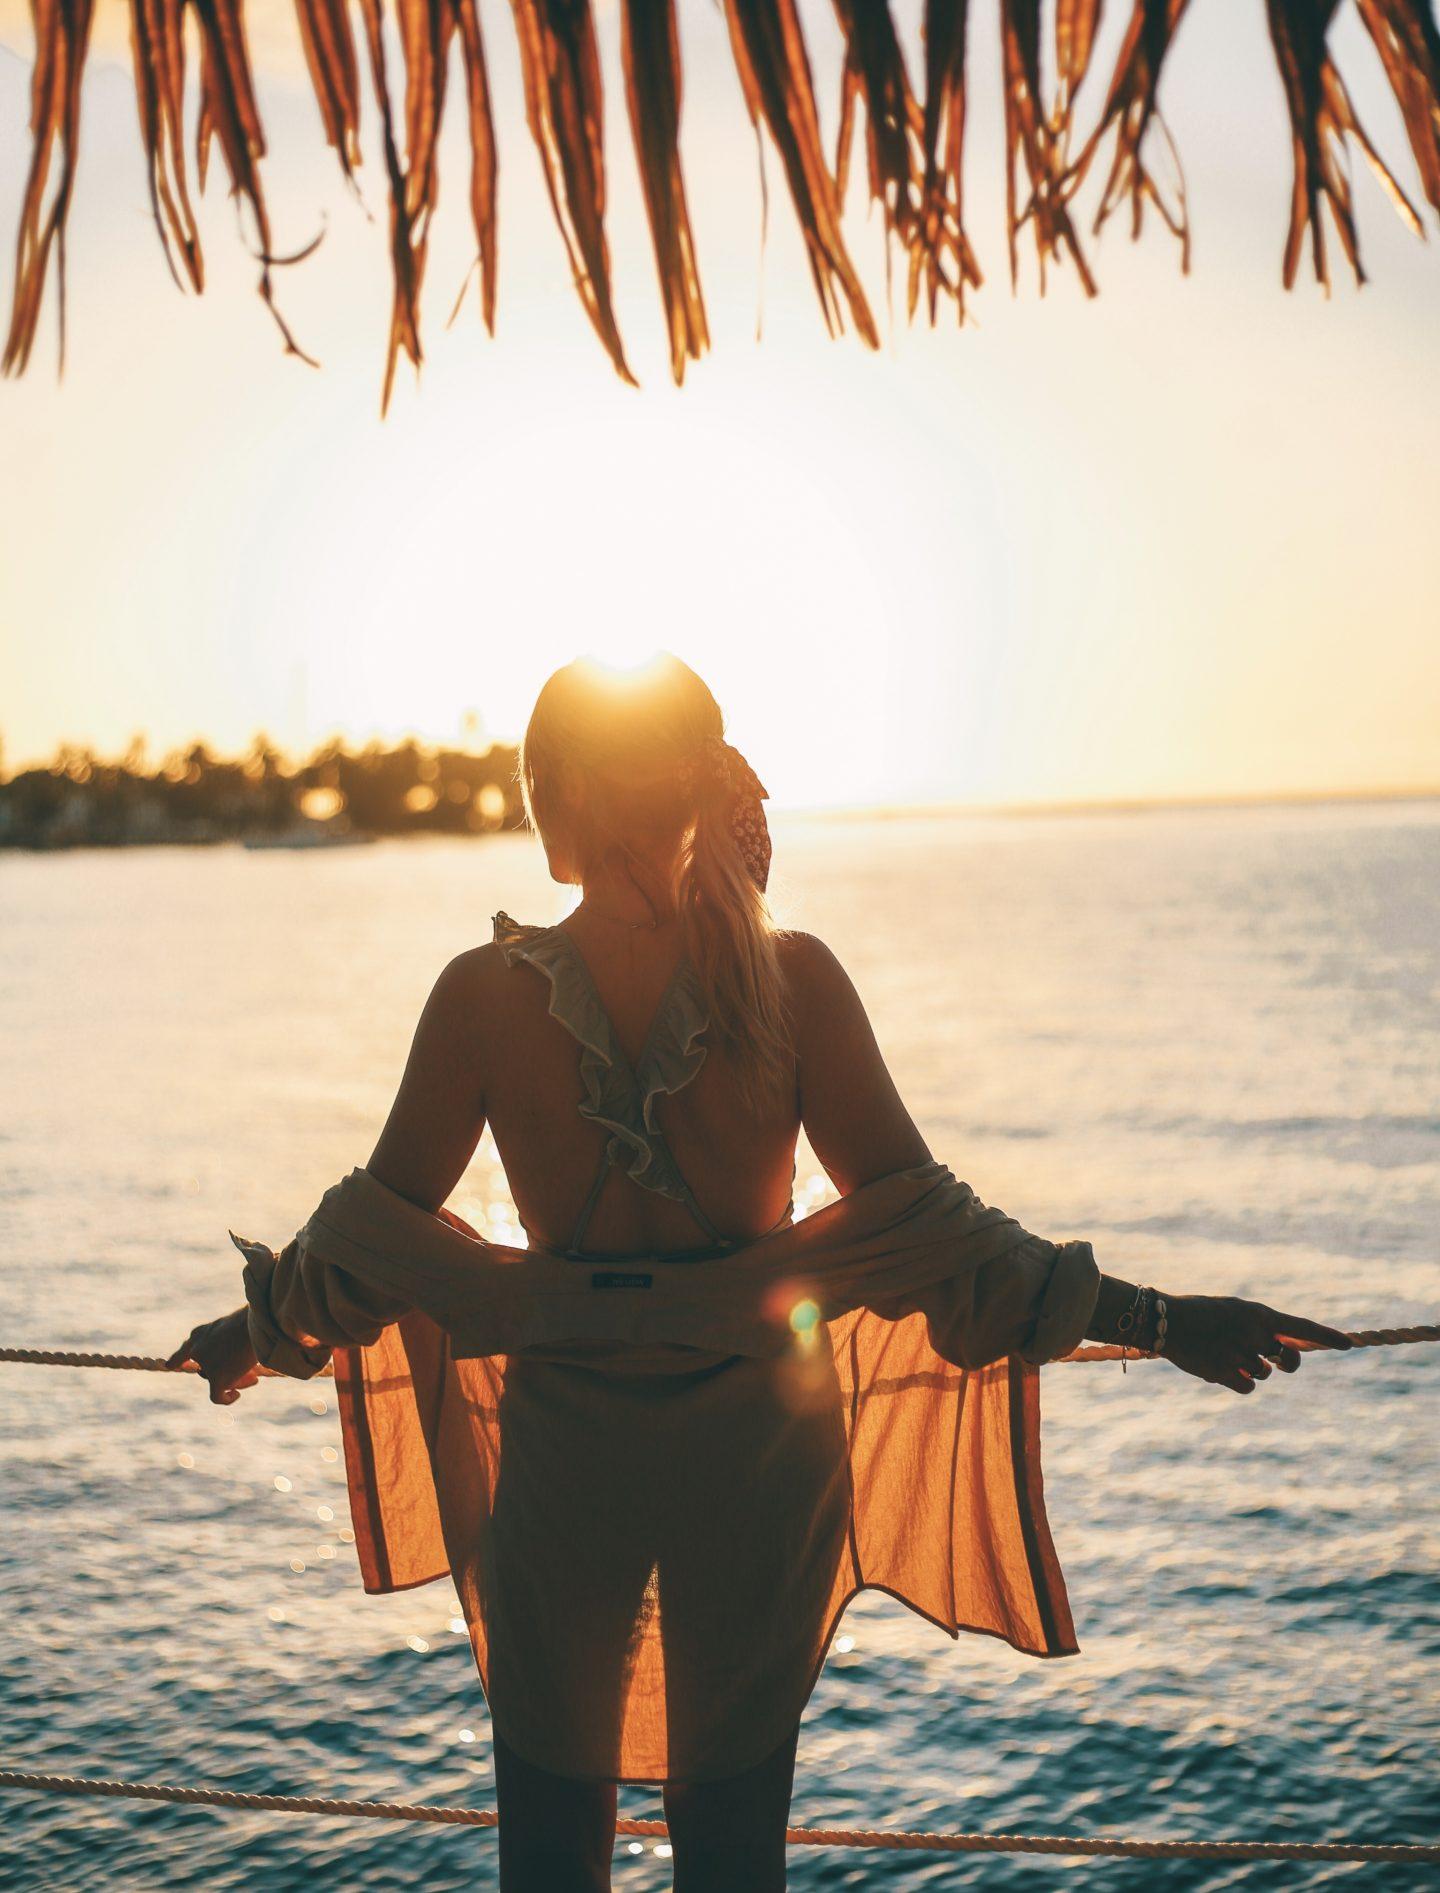 Lever de soleil Guadeloupe - Blondie Baby blog voyage et mode